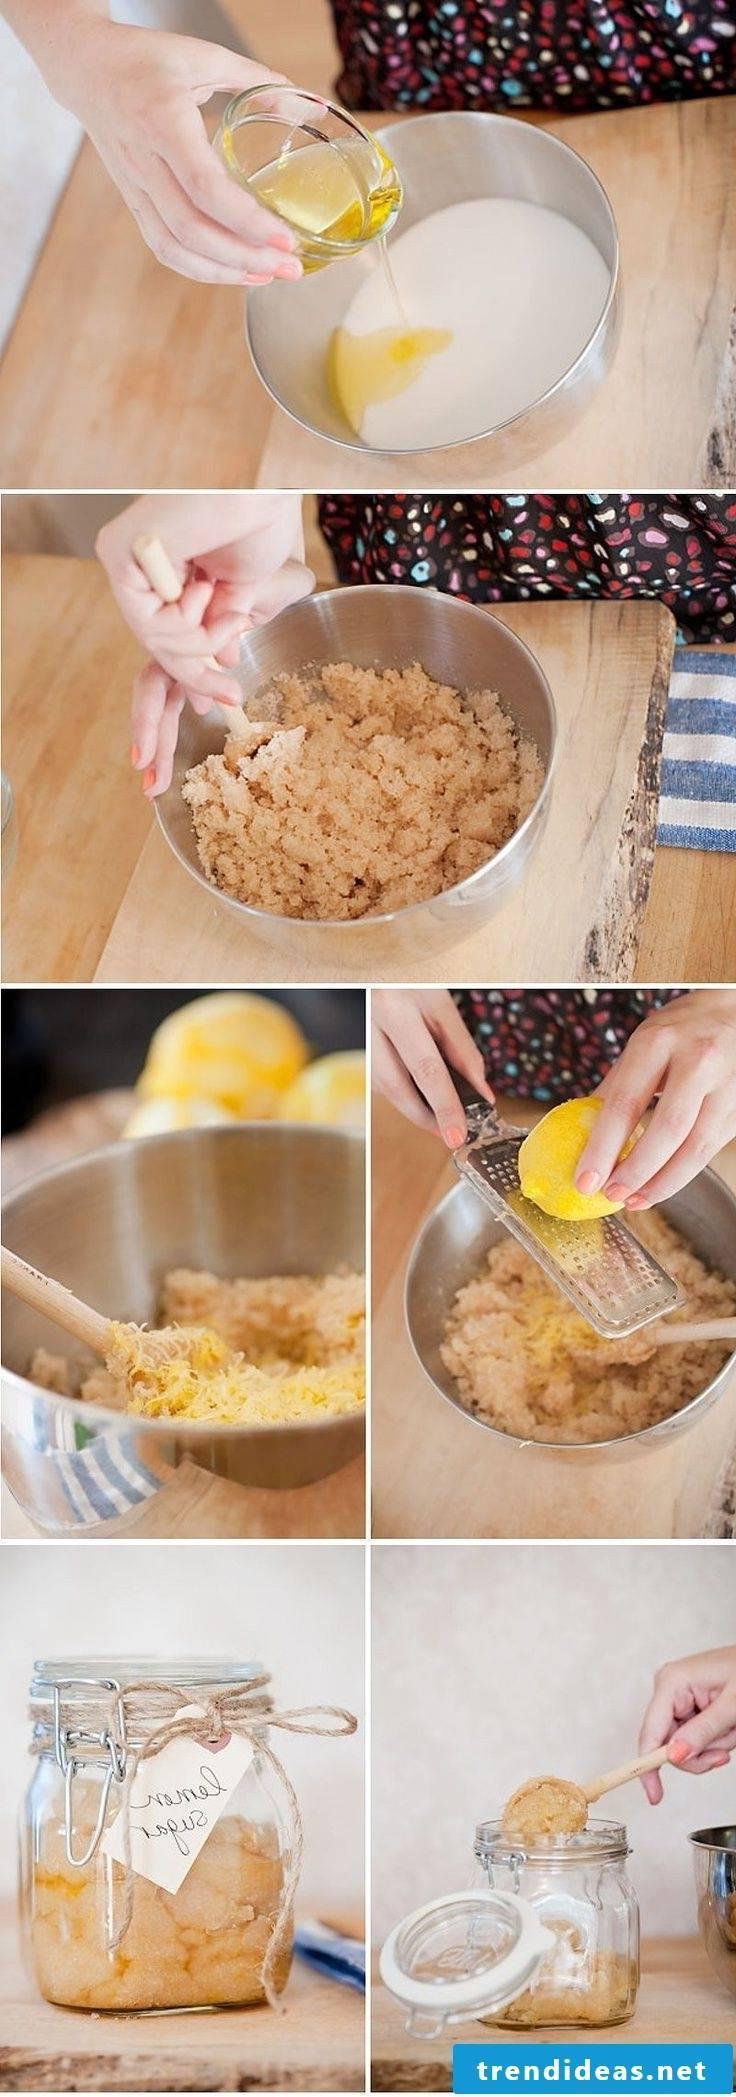 Exfoliate yourself - Lemon sugar scrub recipe